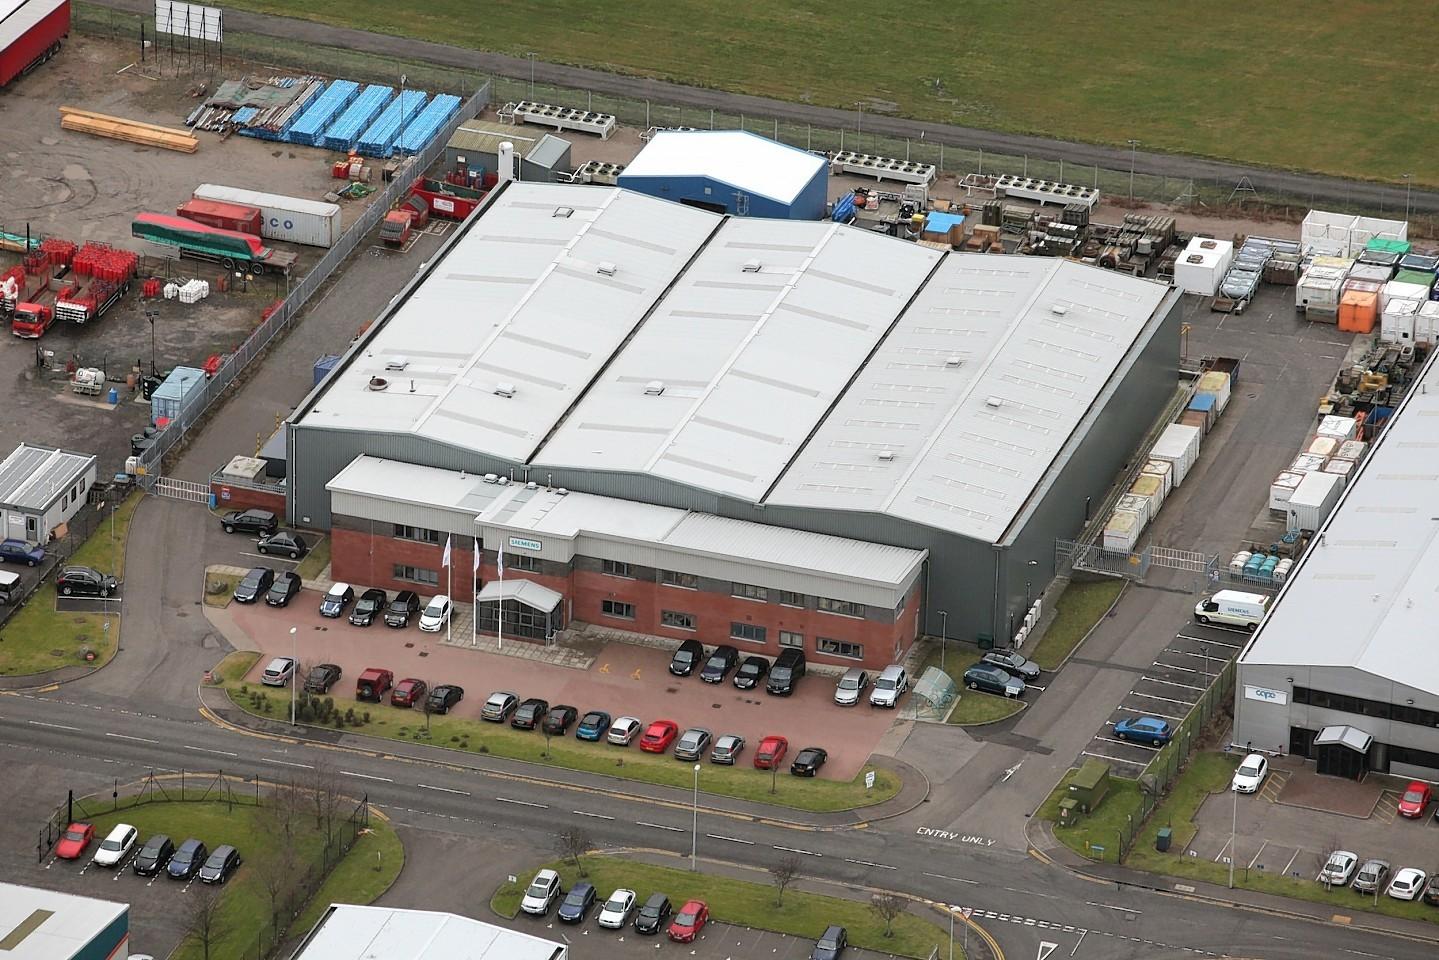 Siemens' site at Dyce